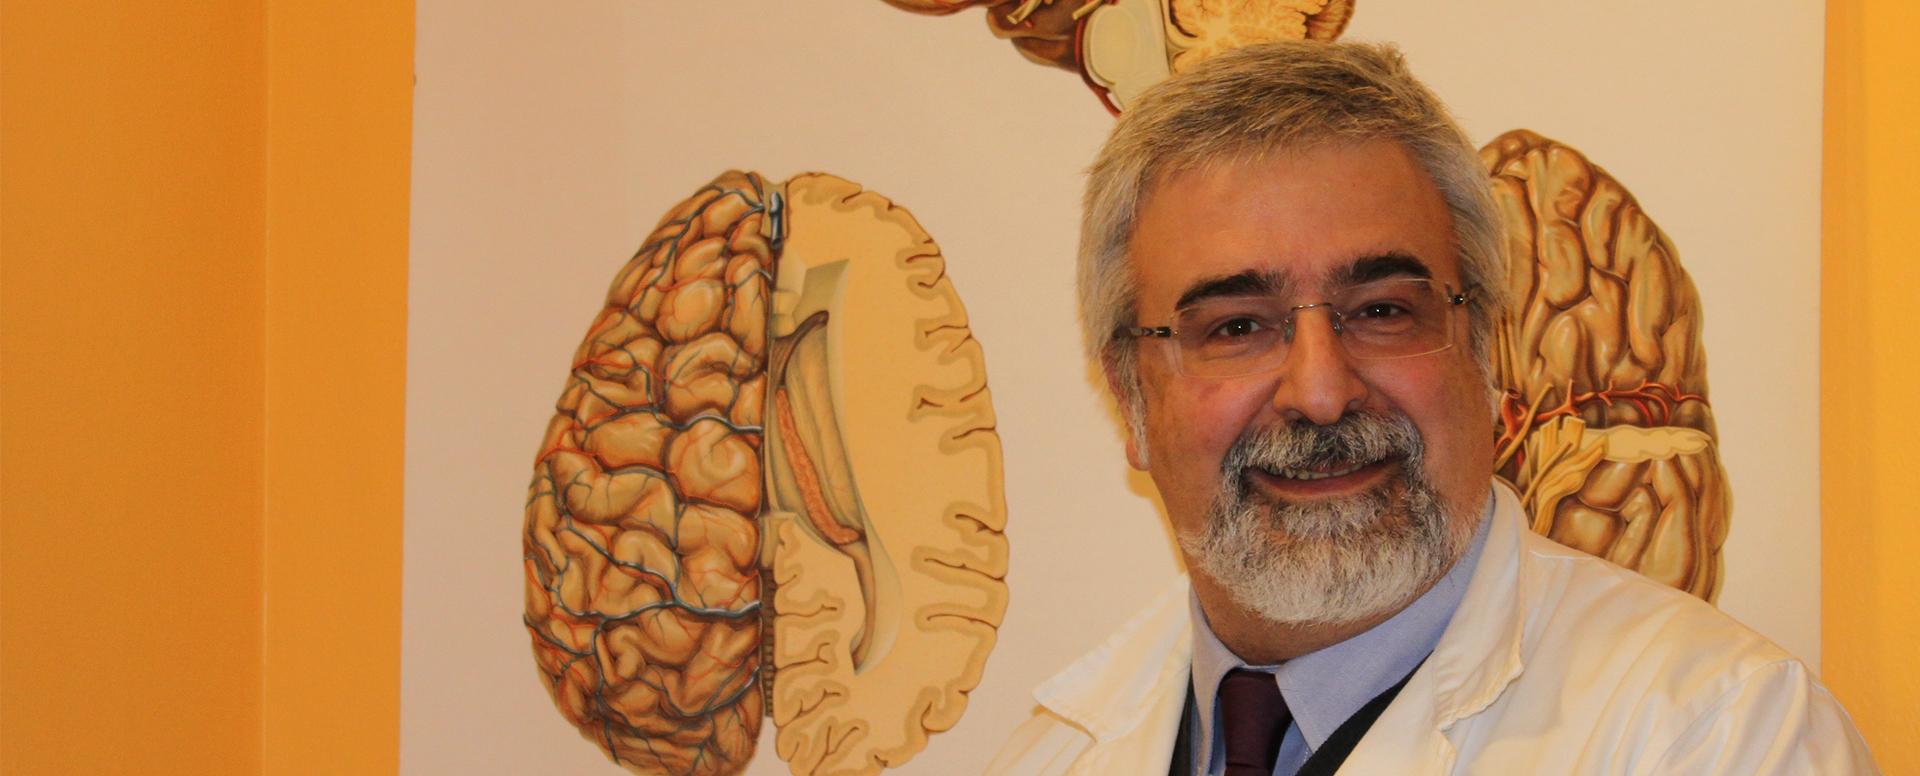 Dott. Gianfranco Lamberti